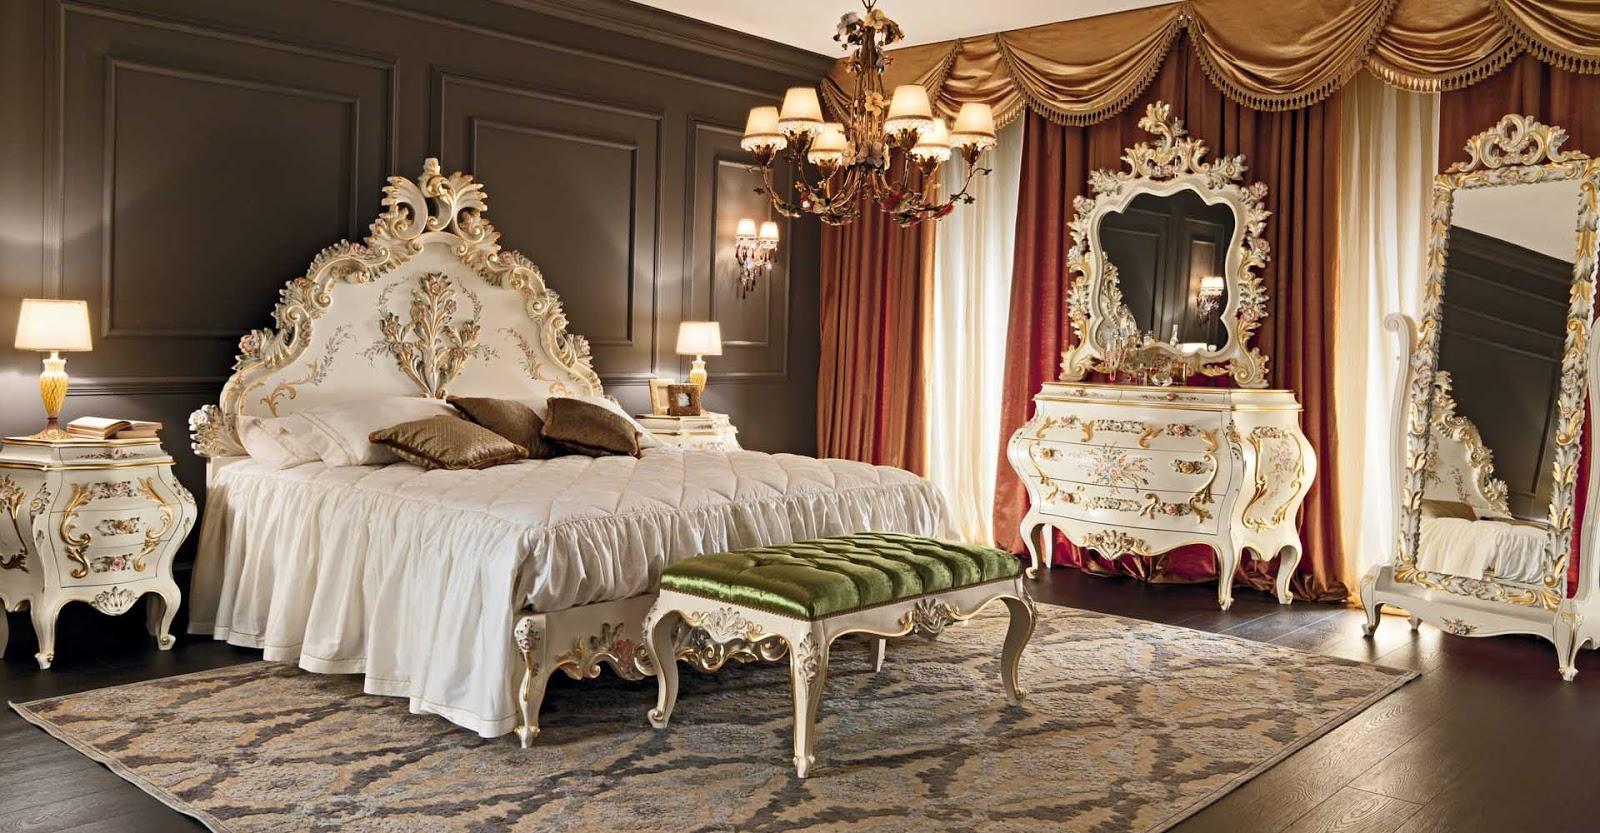 Italian Sofa Designs India Bamboo Set Images 23 Amazing Luxury Bedroom Furniture Ideas ~ Home Design